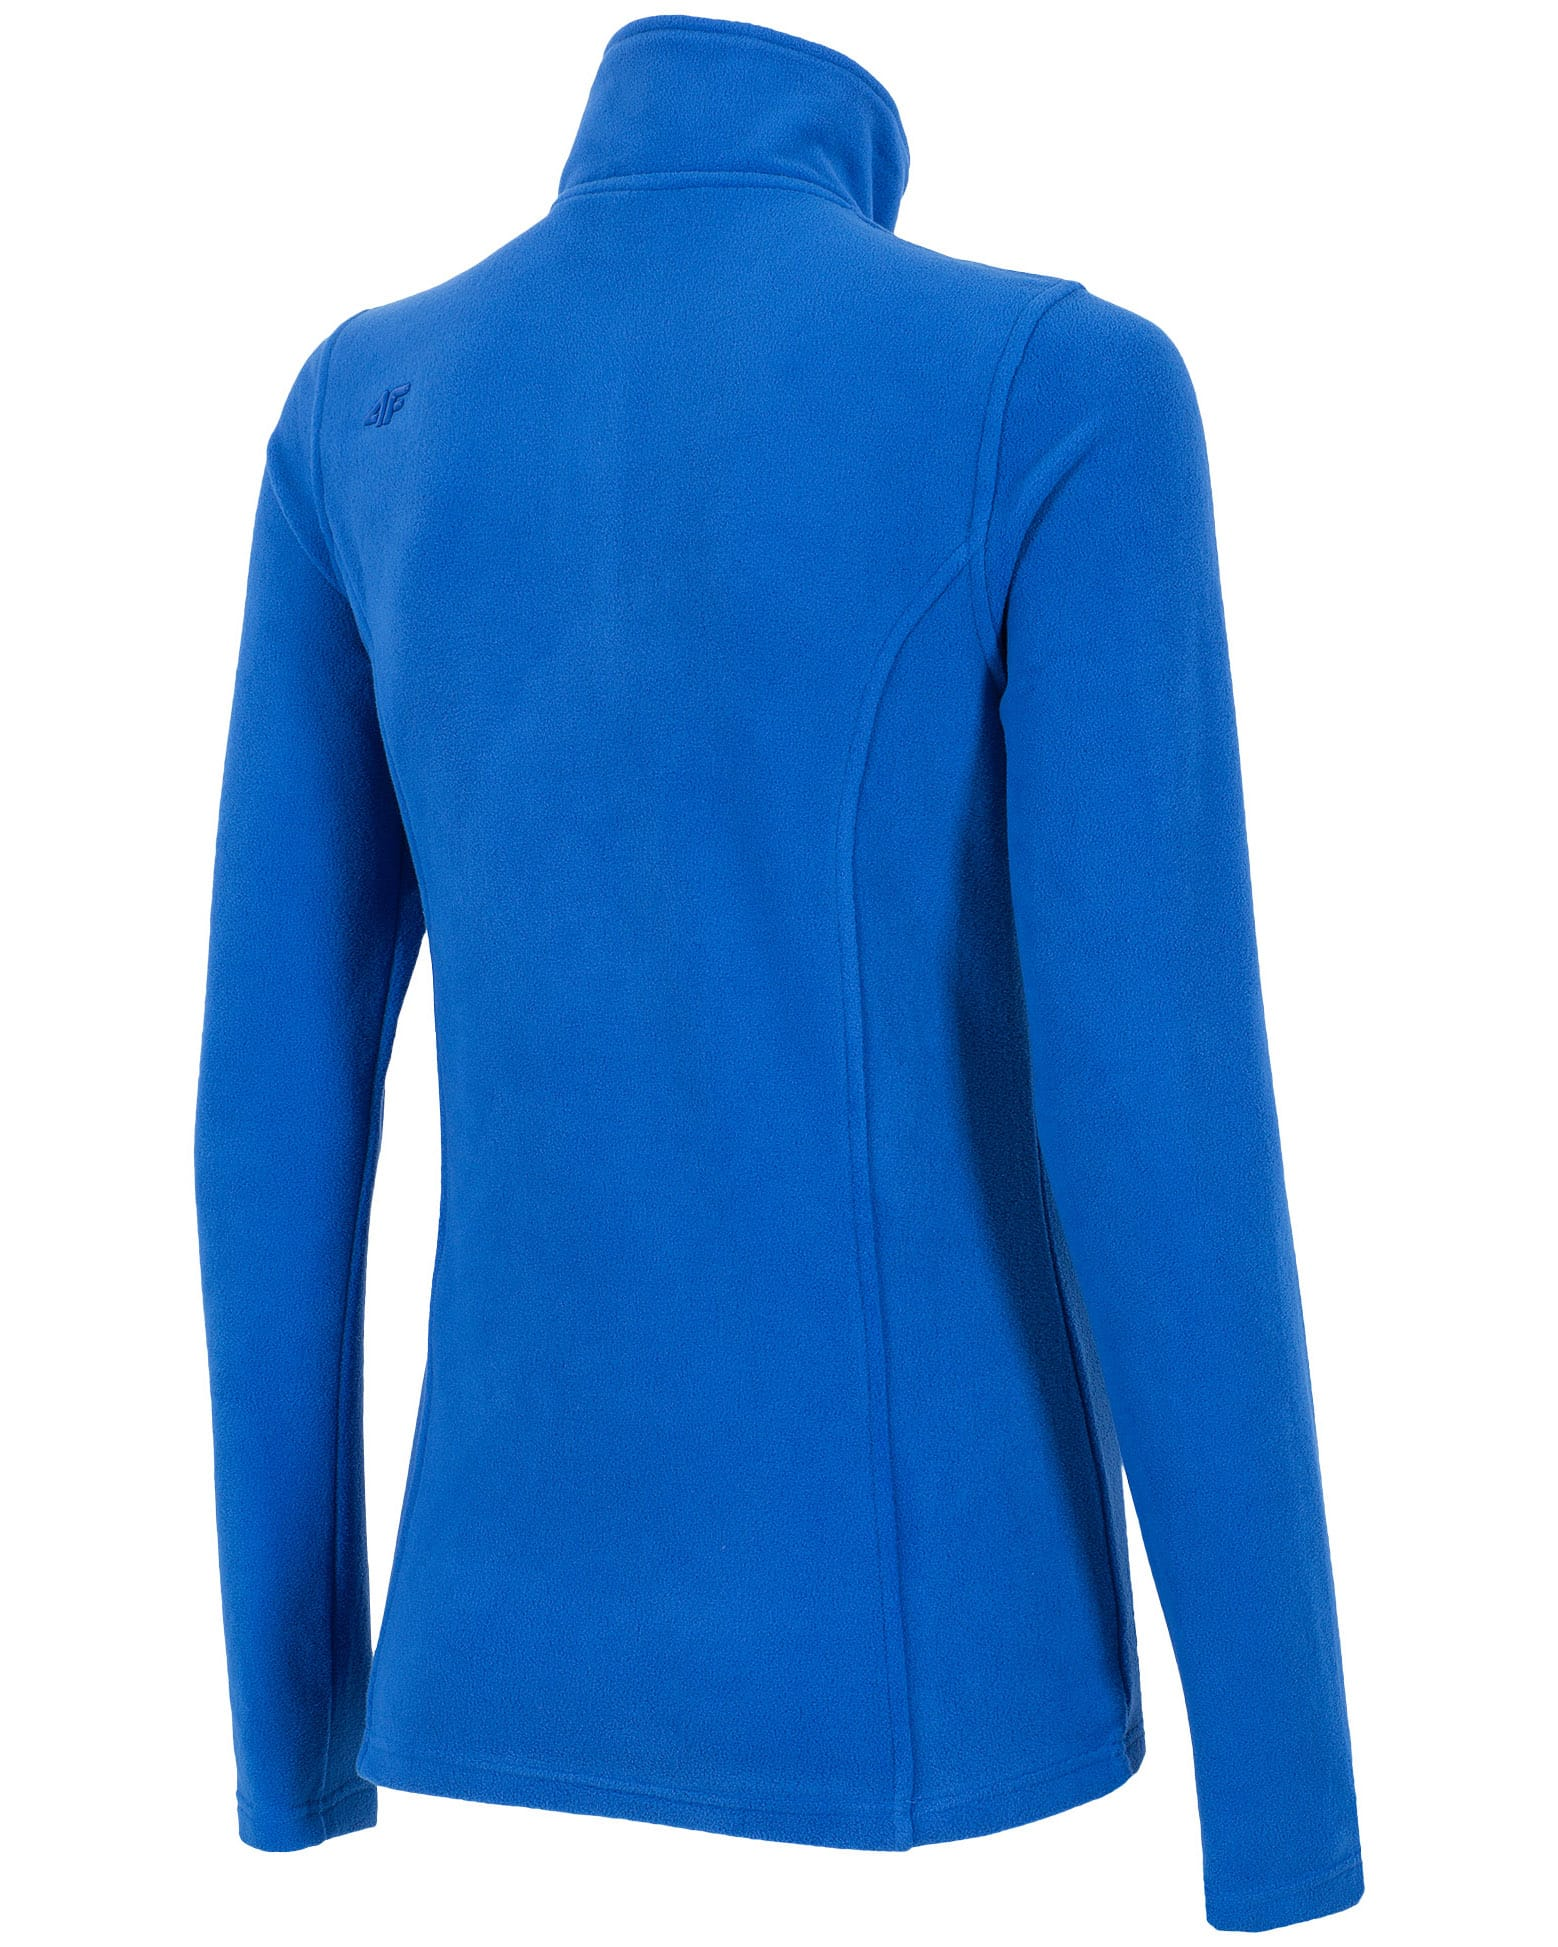 4F Fleece Underwear - Blue Cornflower